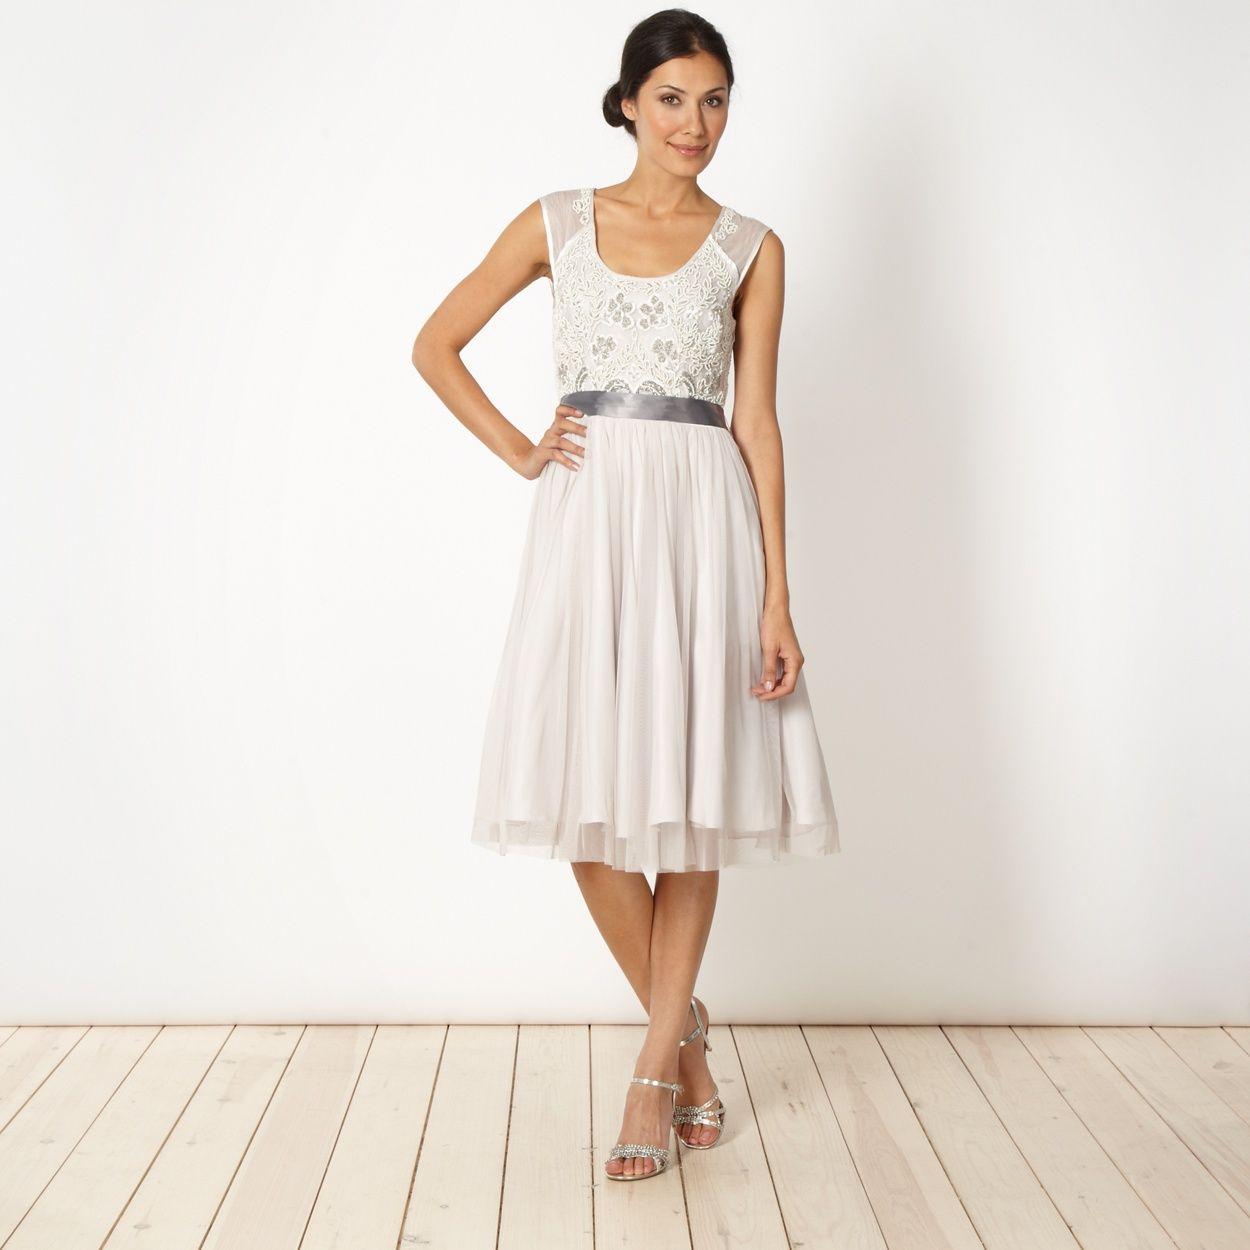 No 1 jenny packham designer pale pink beaded bodice dress at 1 jenny packham designer pale pink beaded bodice dress at debenhams ombrellifo Gallery